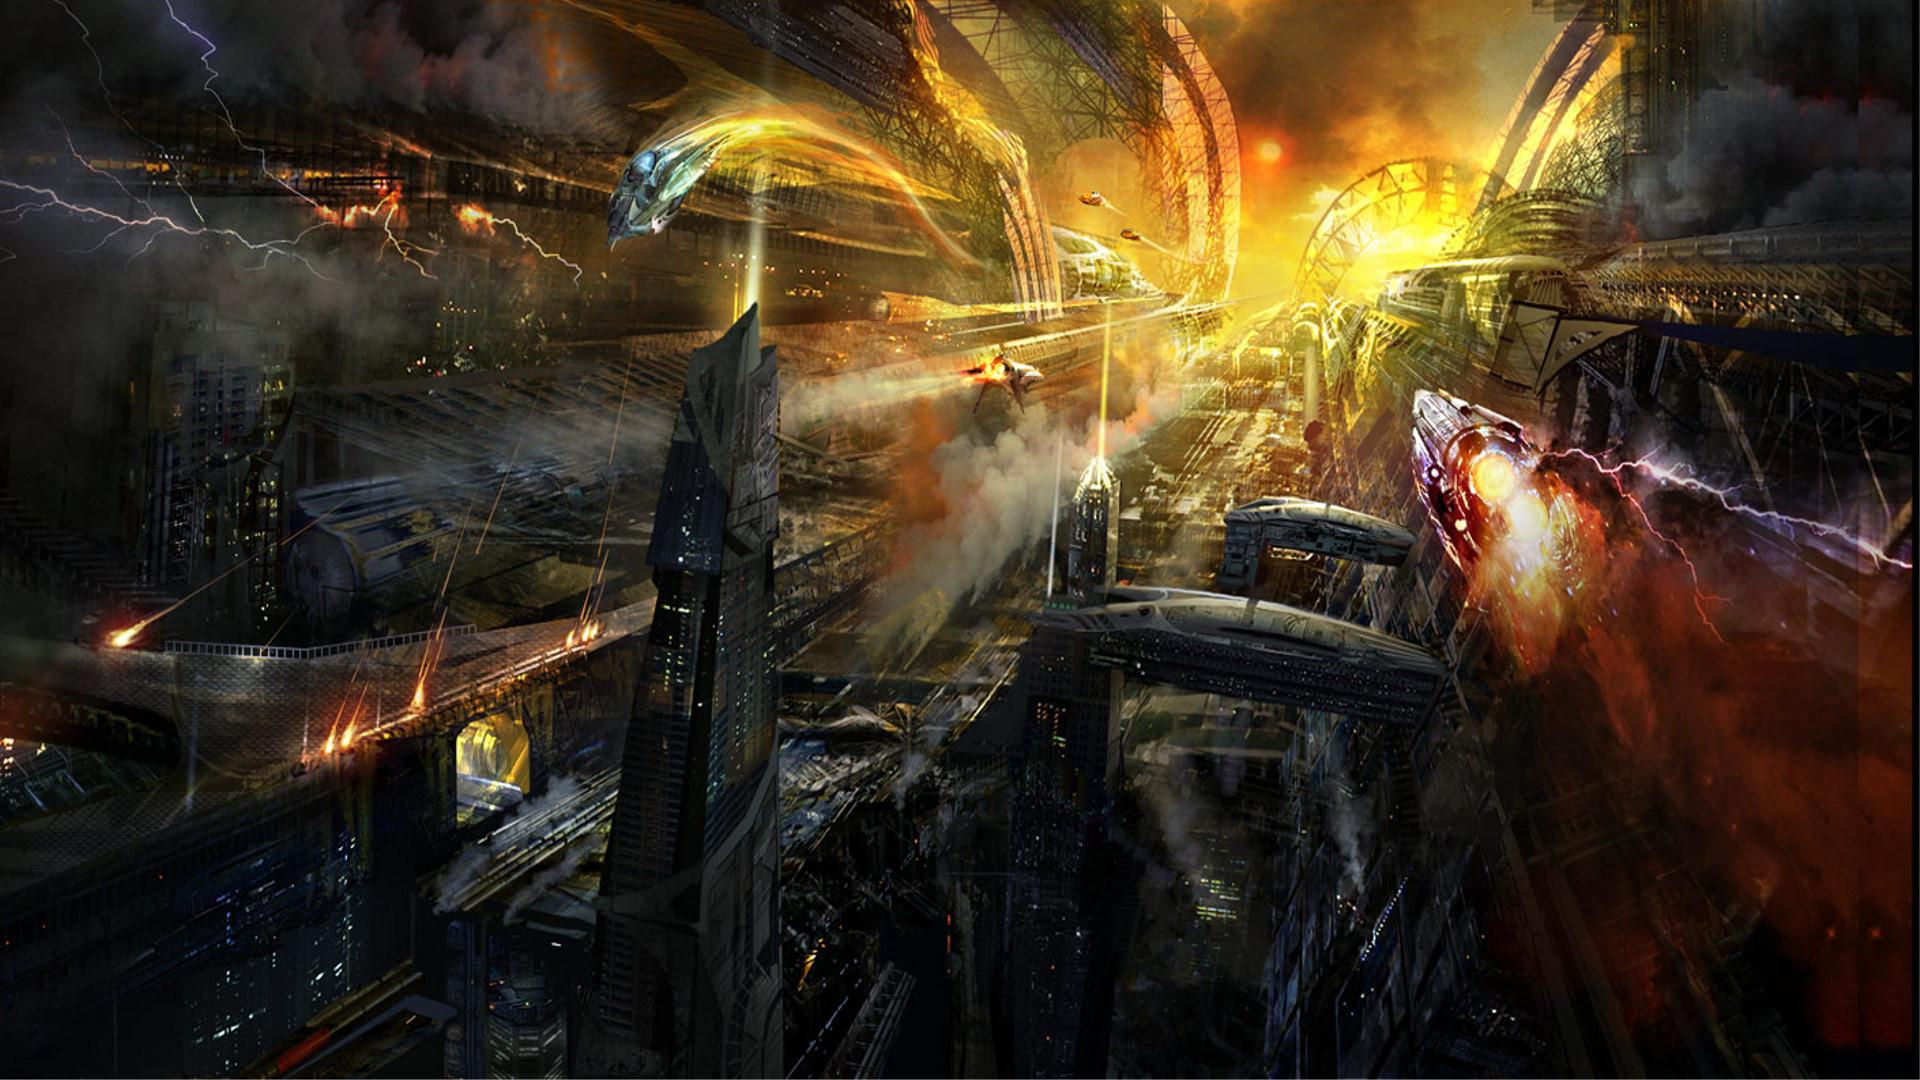 Res: 1920x1080, Sci Fi - War Wallpaper